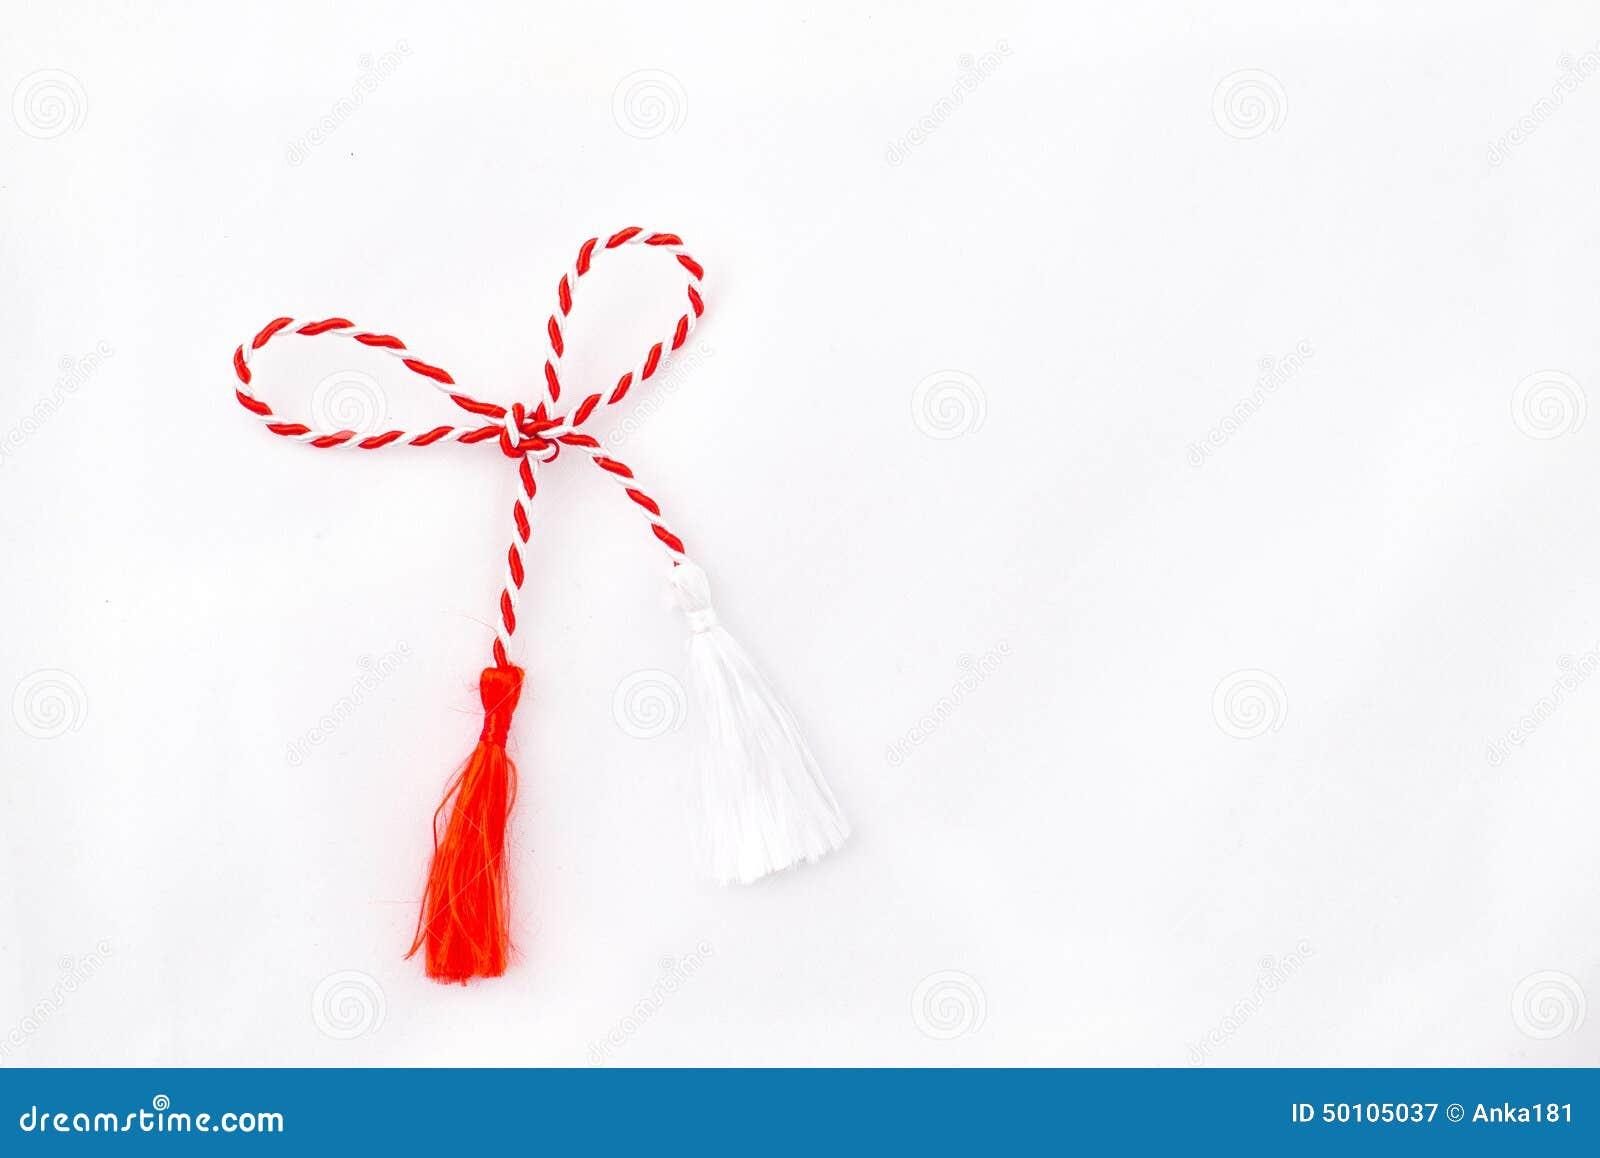 Love the spring symbol martenitsa